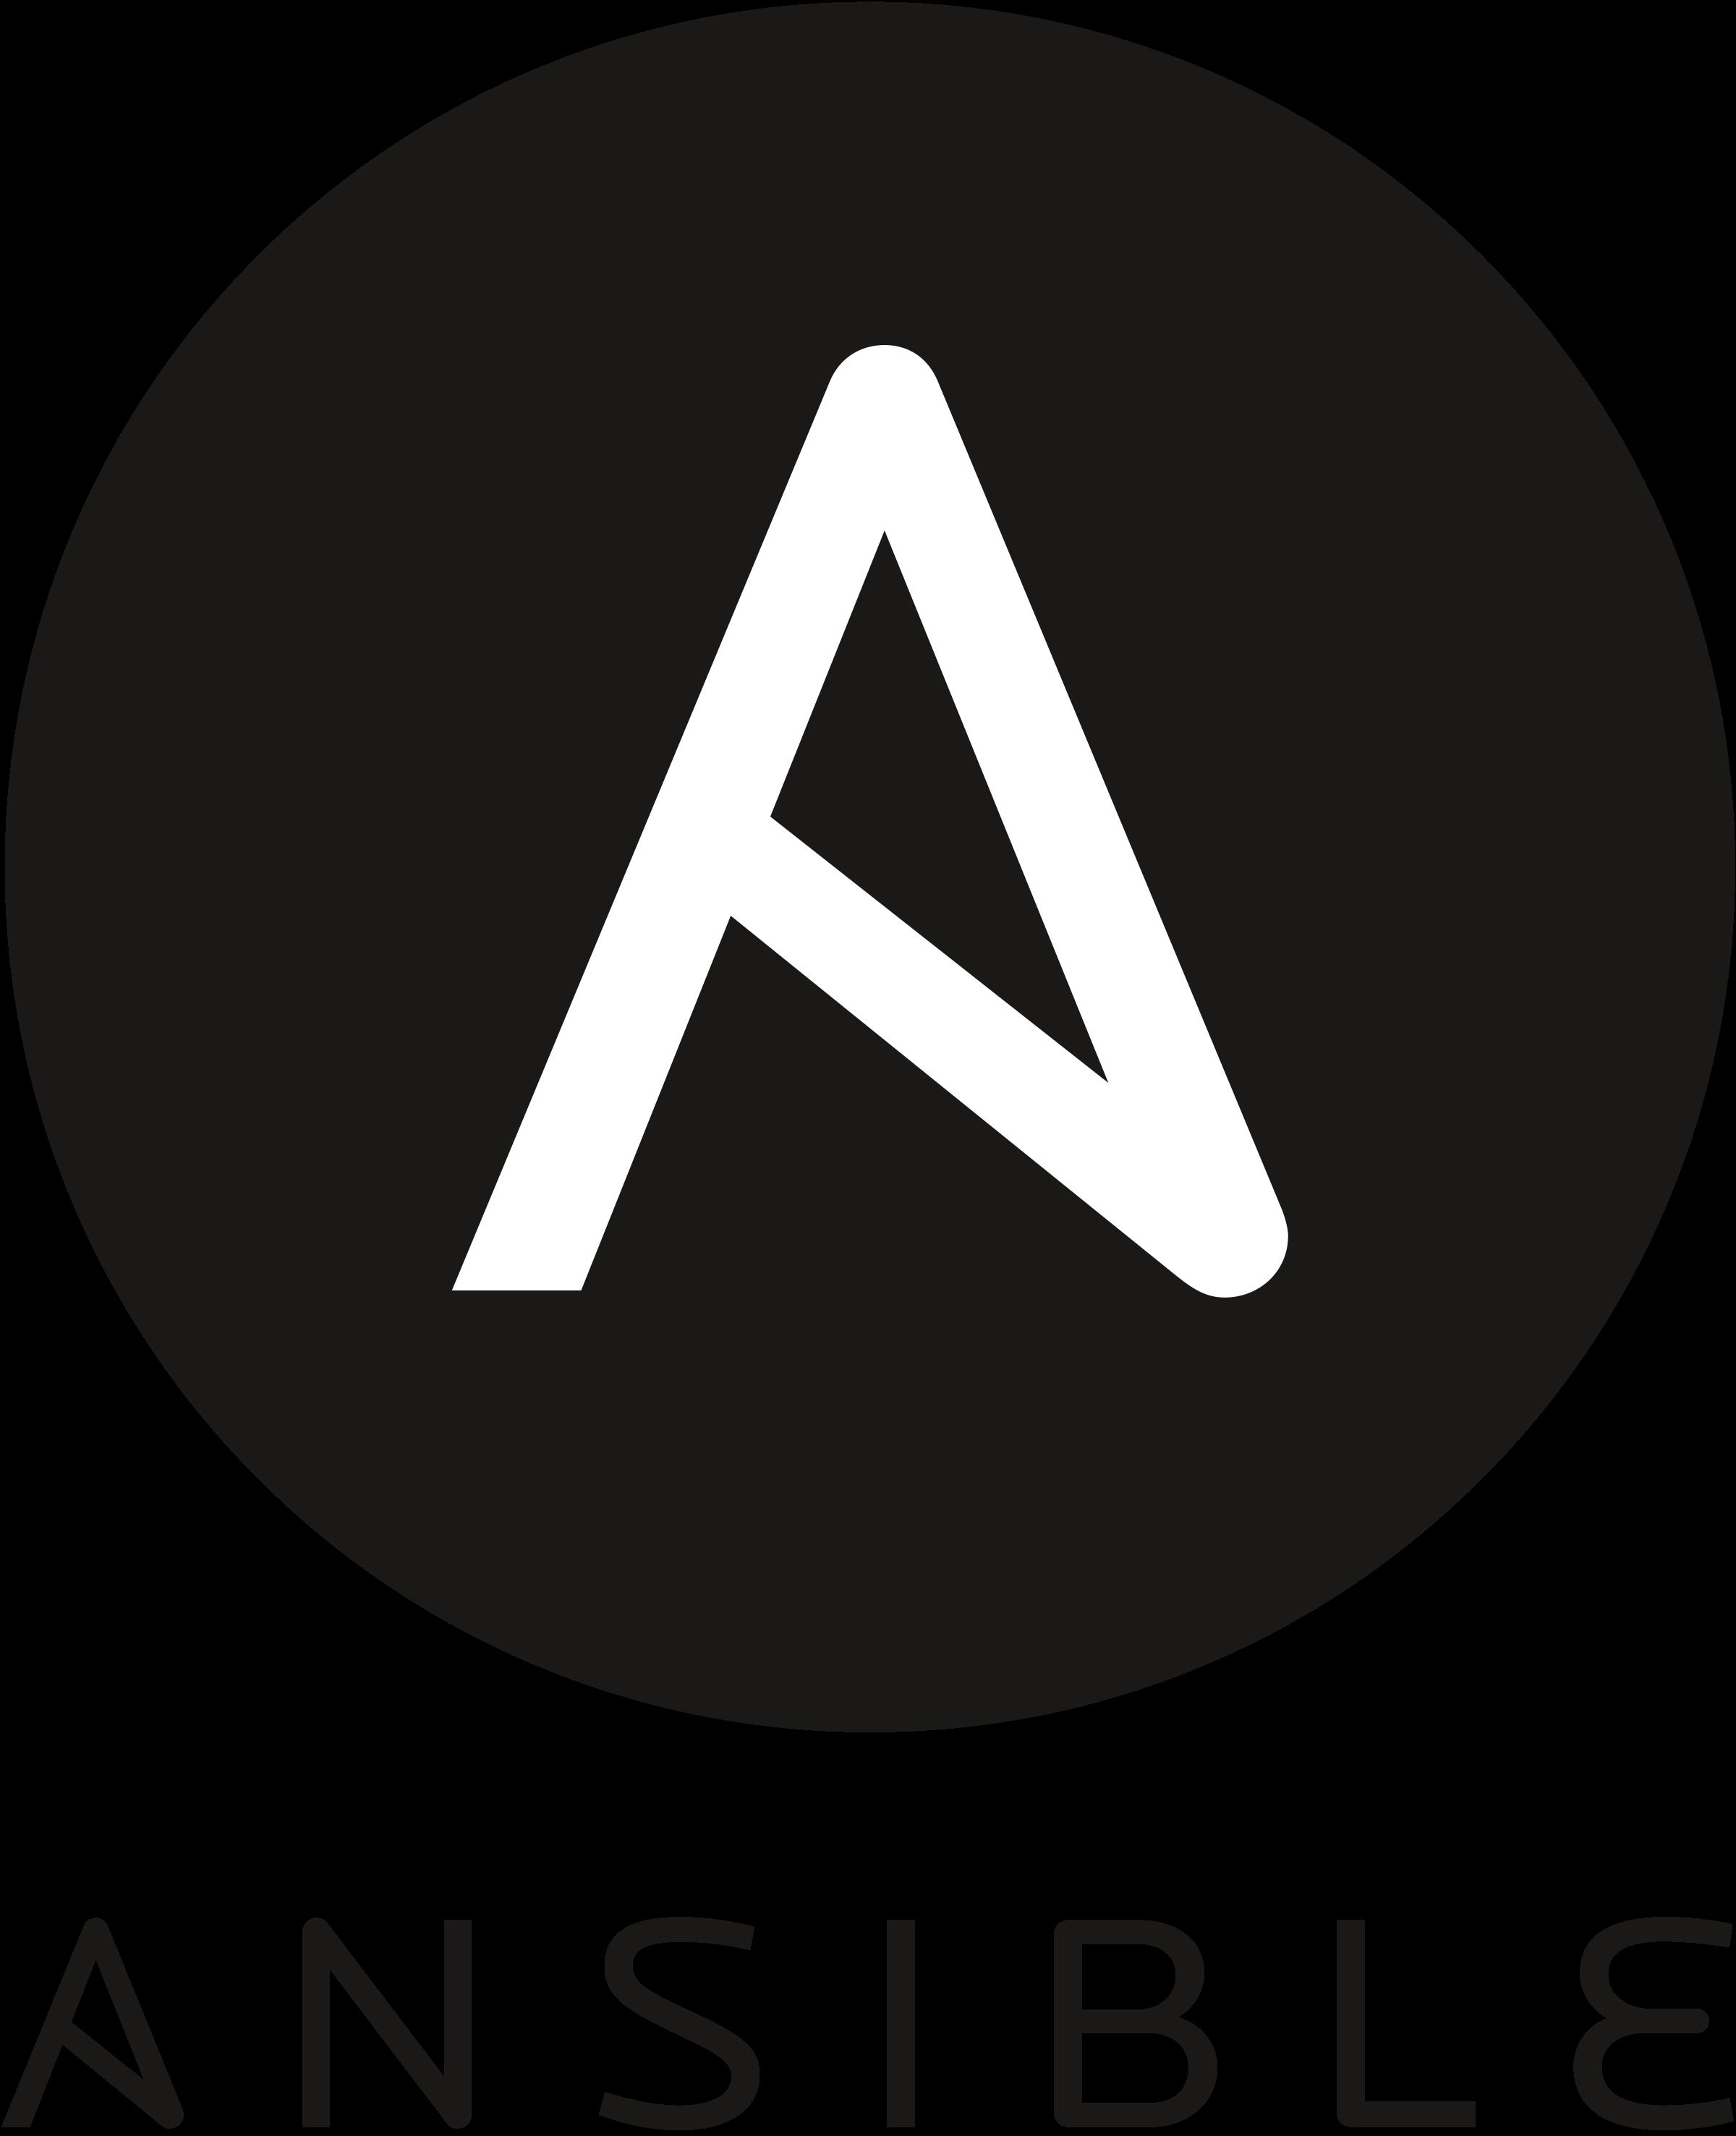 ansible-logo-png-transparent.png